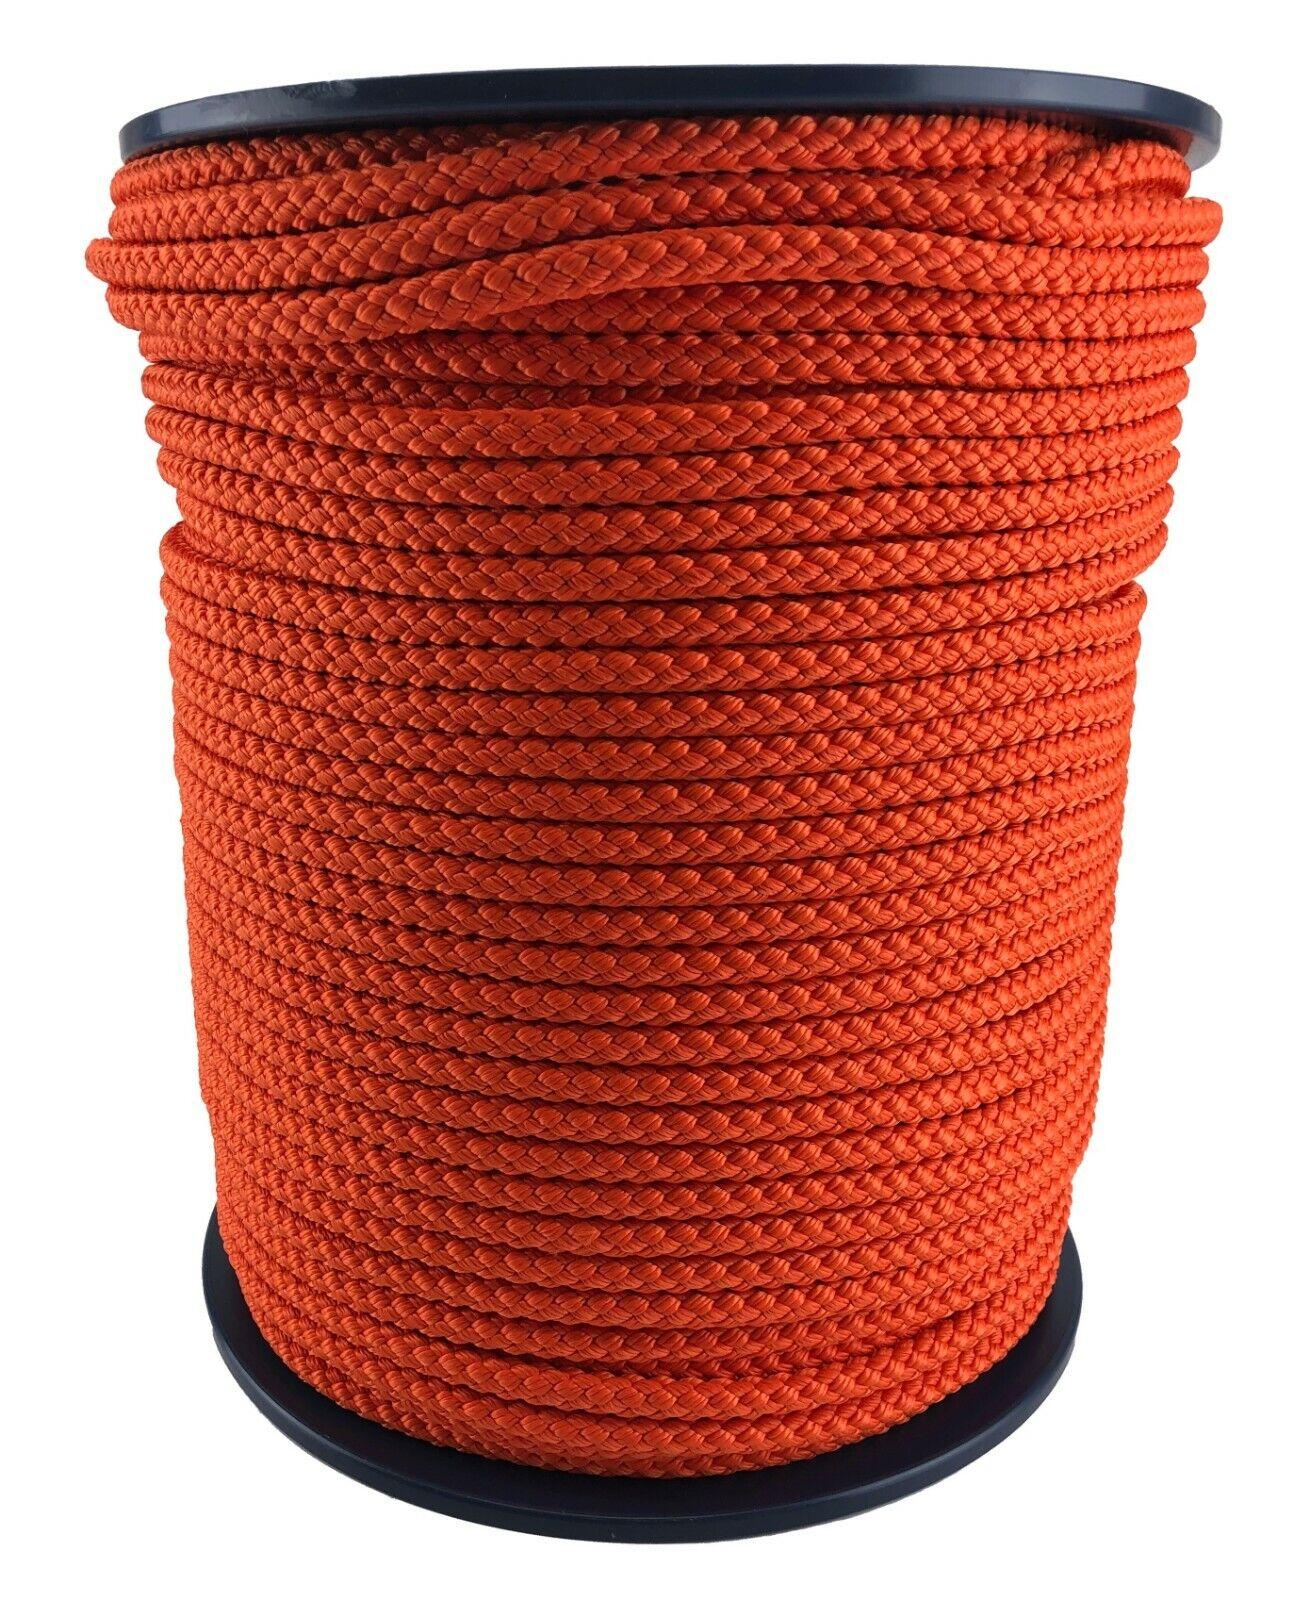 10mm orange Braided Polypropylene Rope Poly Line Sailing Boating